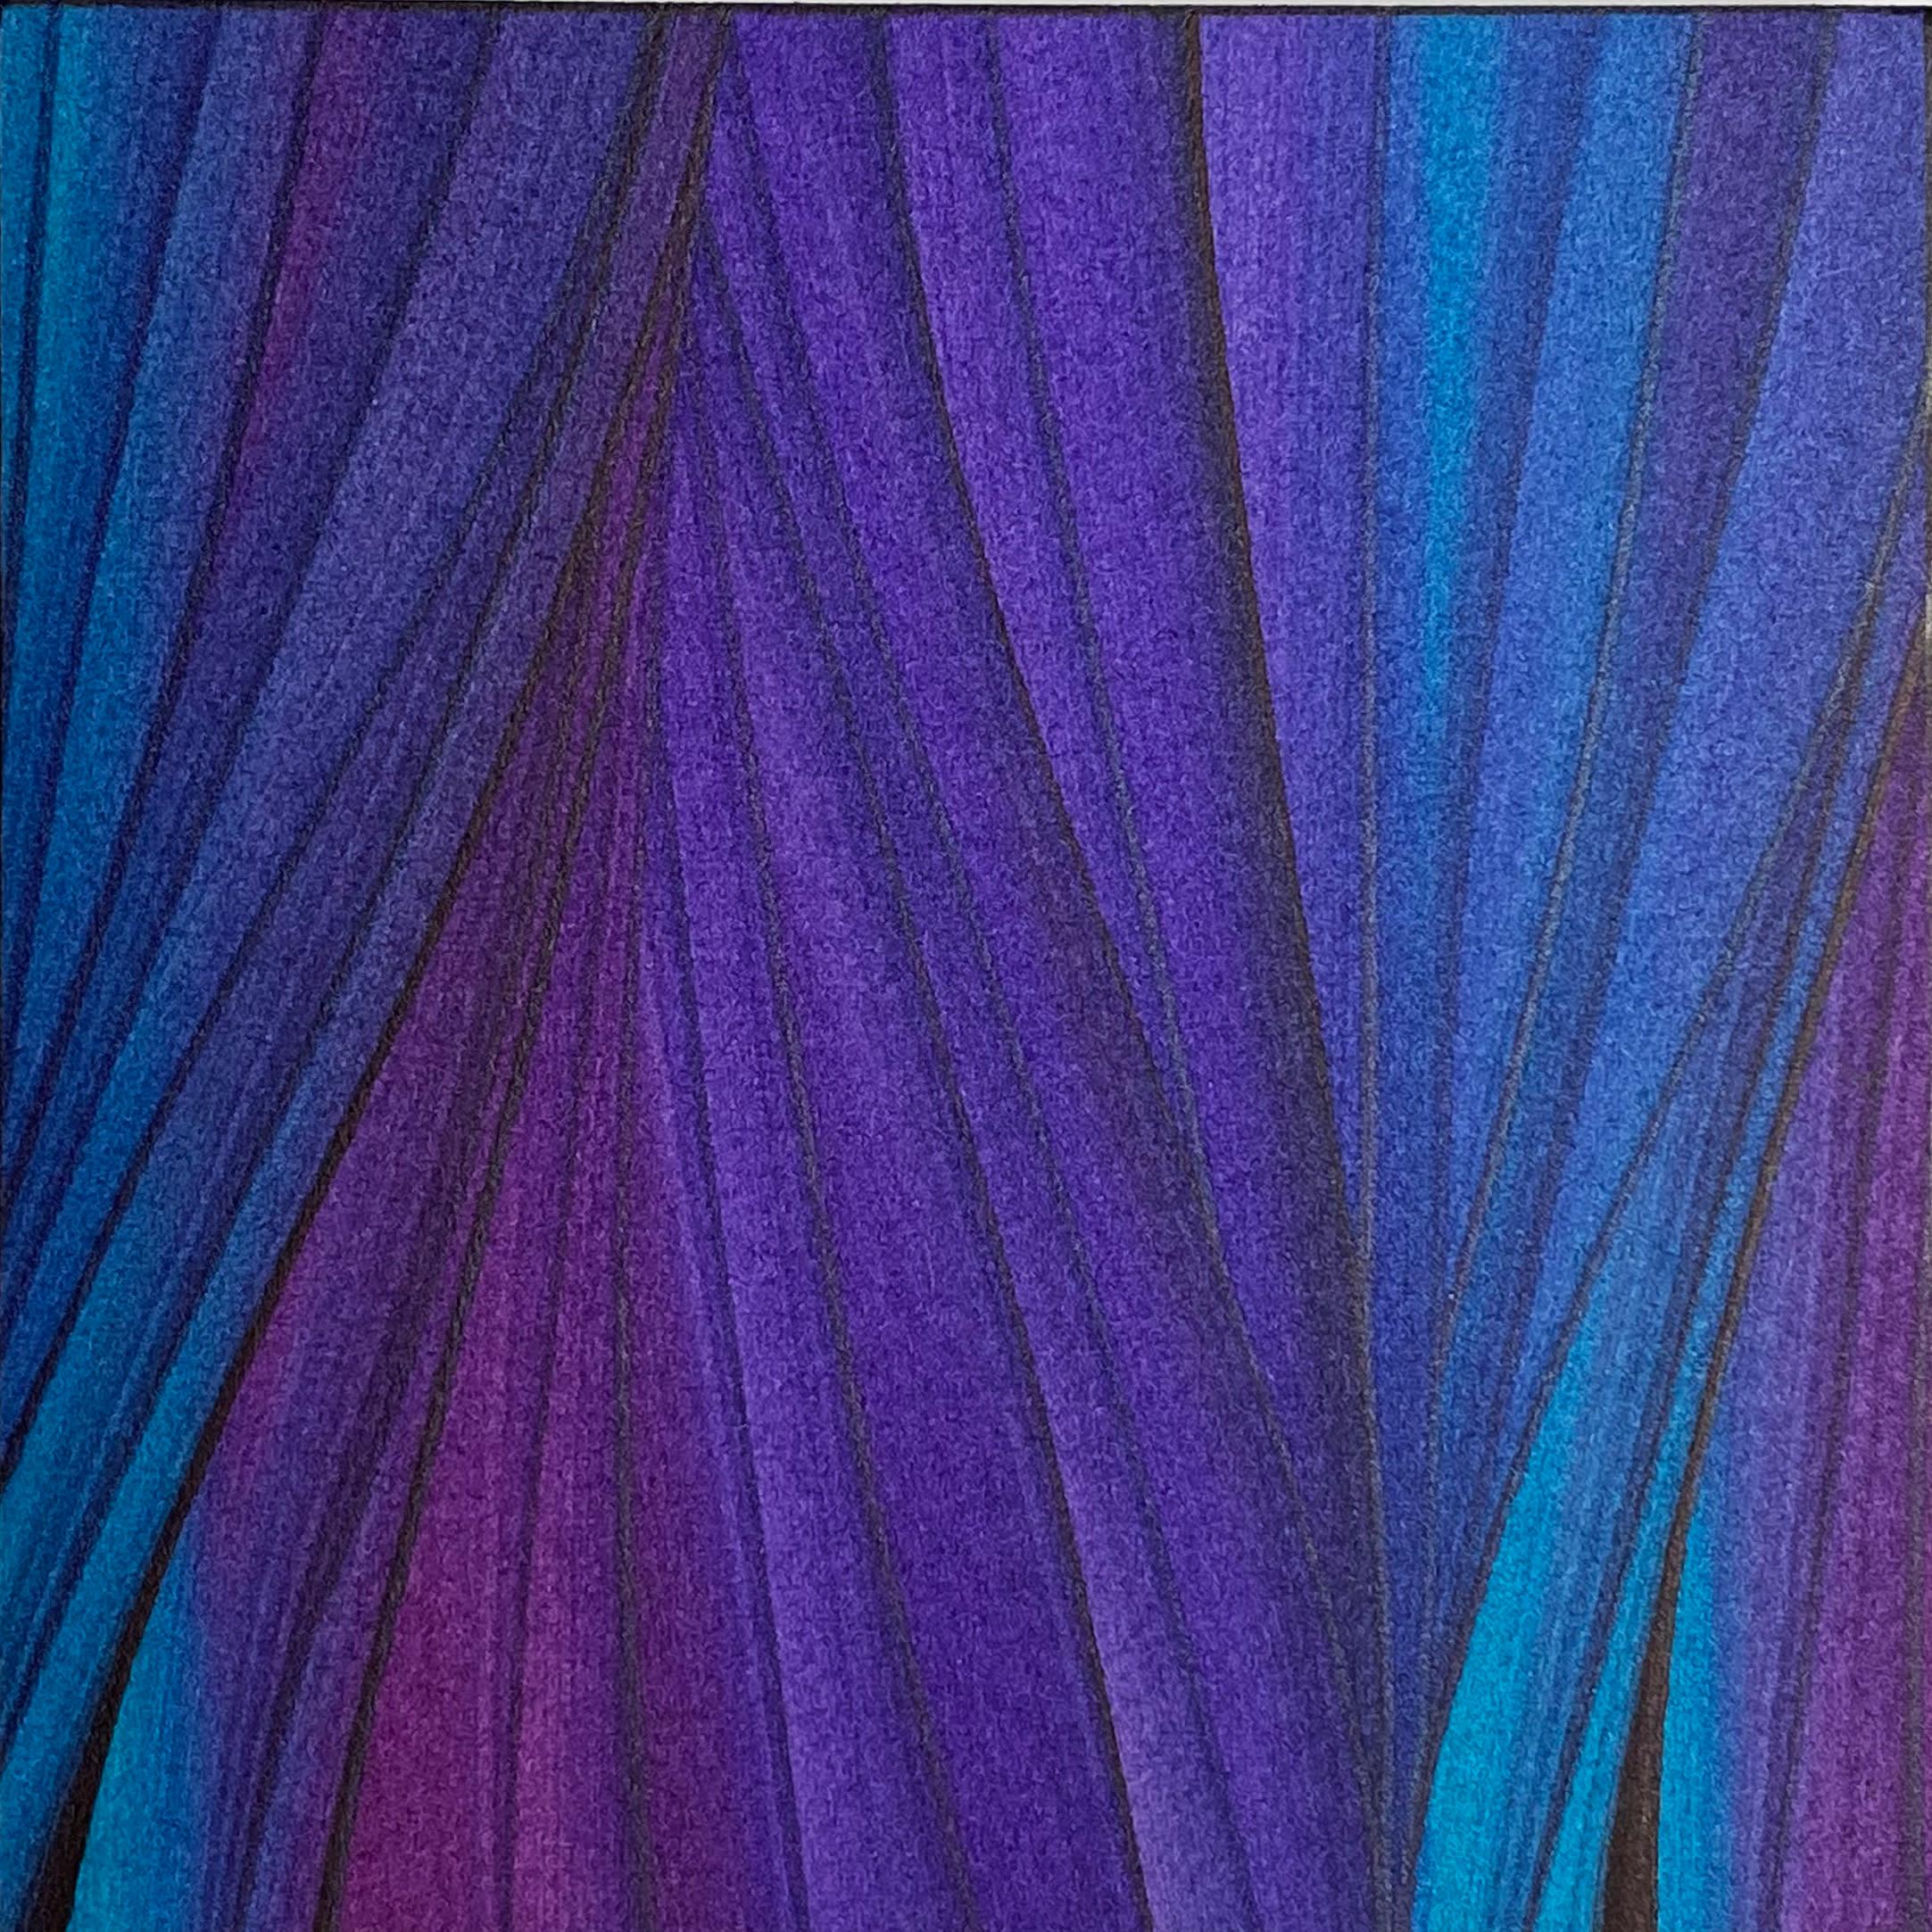 Purple 30 lujv54